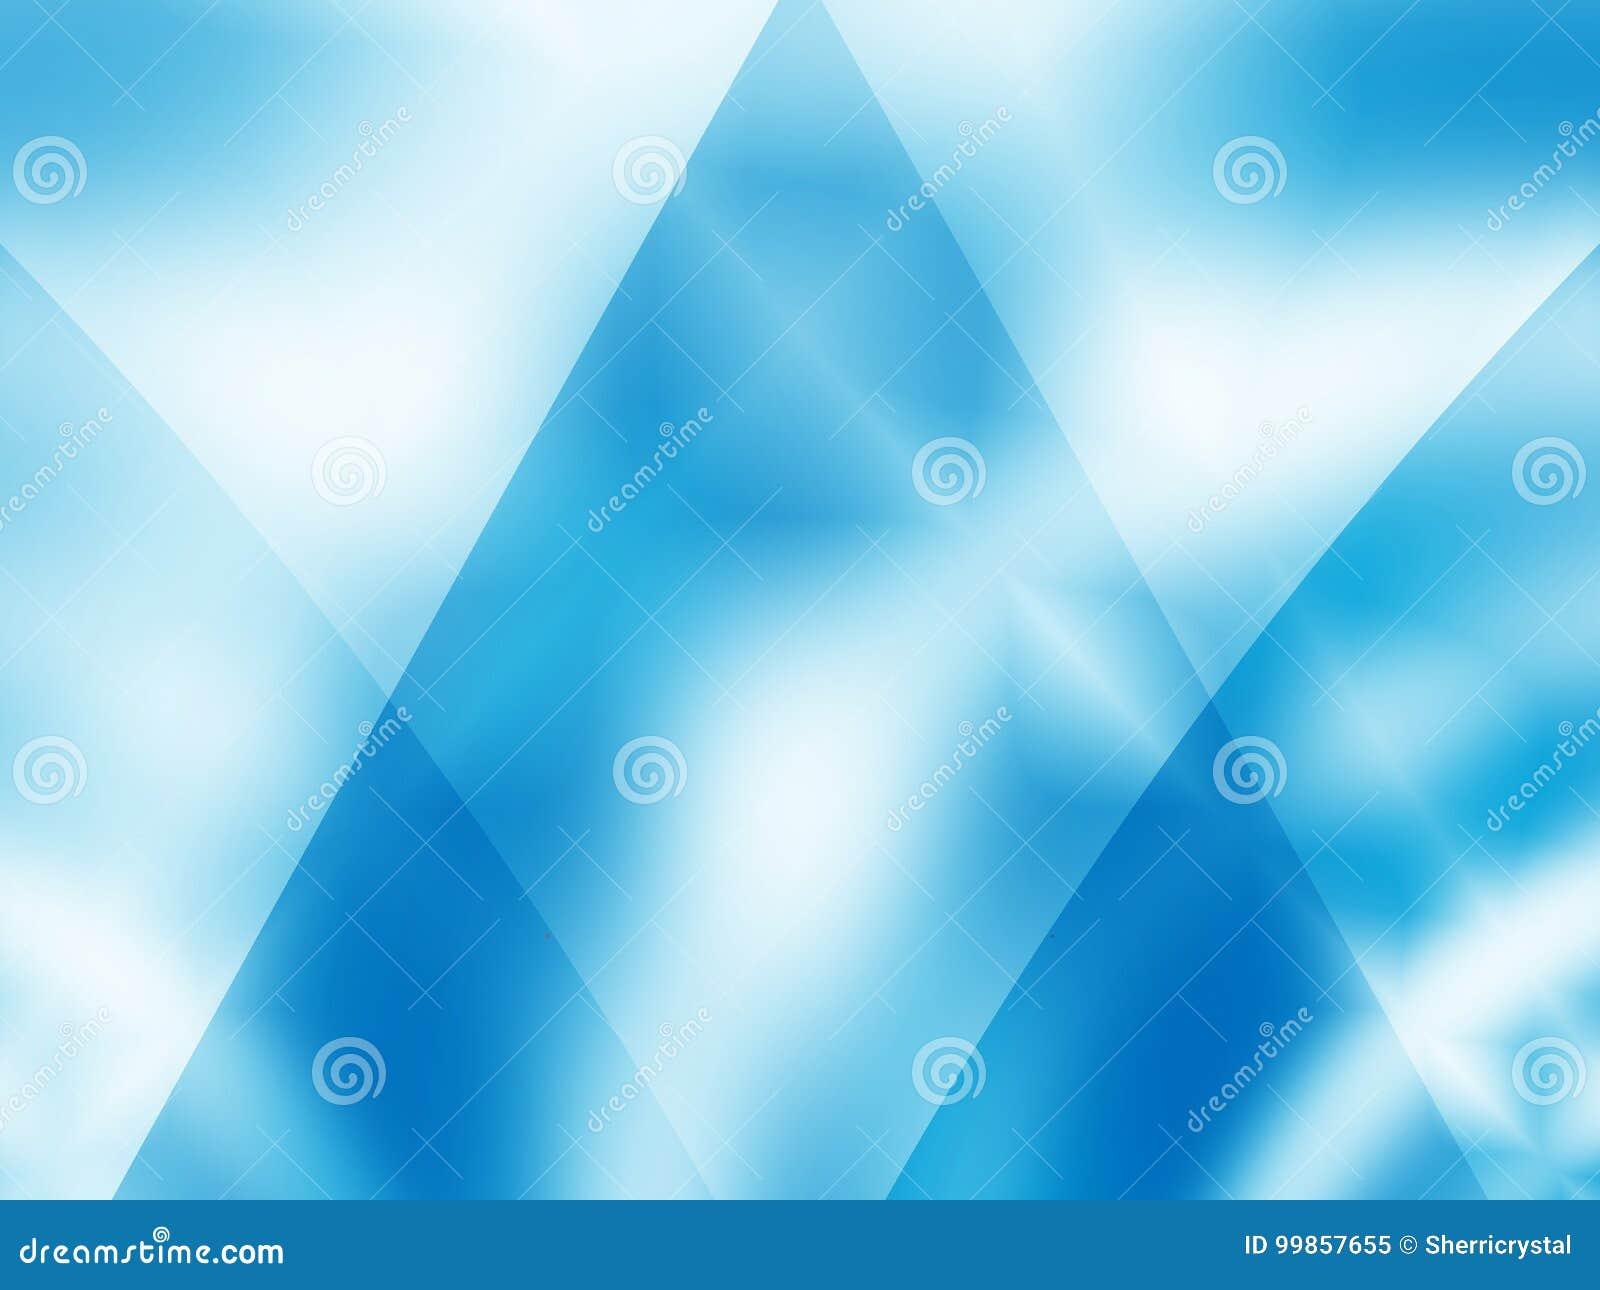 43c60b67 Light blue modern abstract fractal art. Shiny background illustration.  Download preview